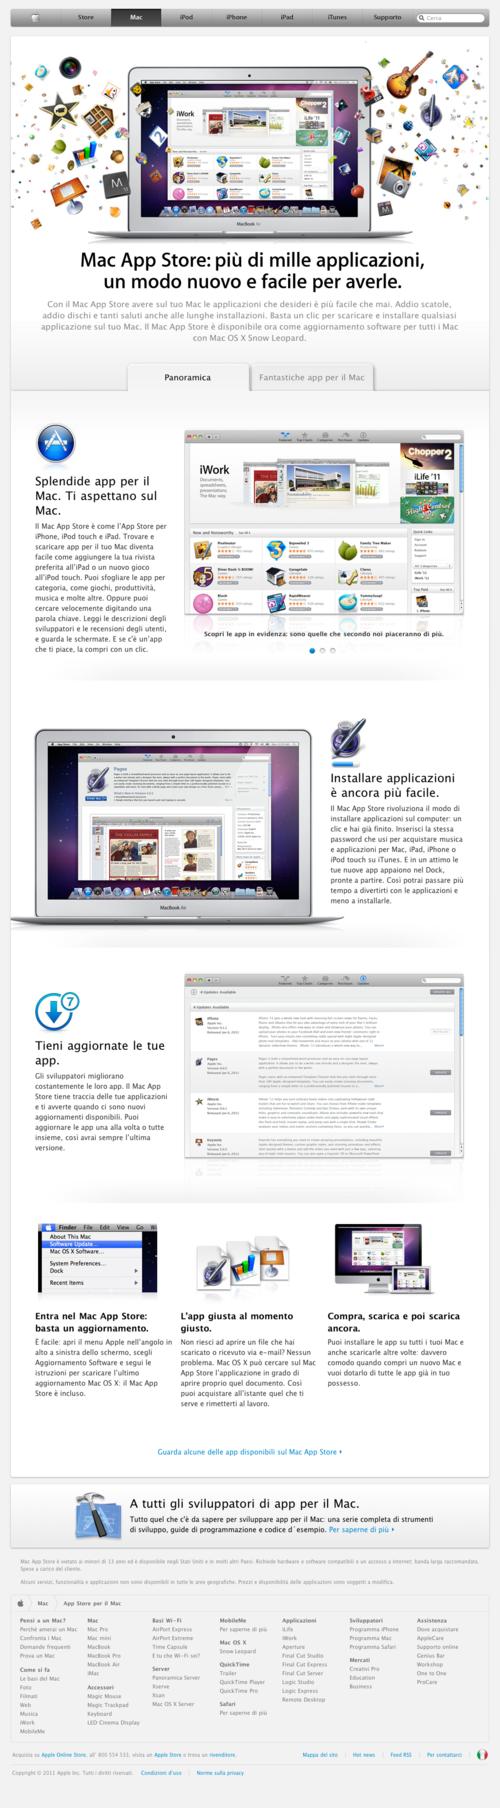 Mac AppStore is here